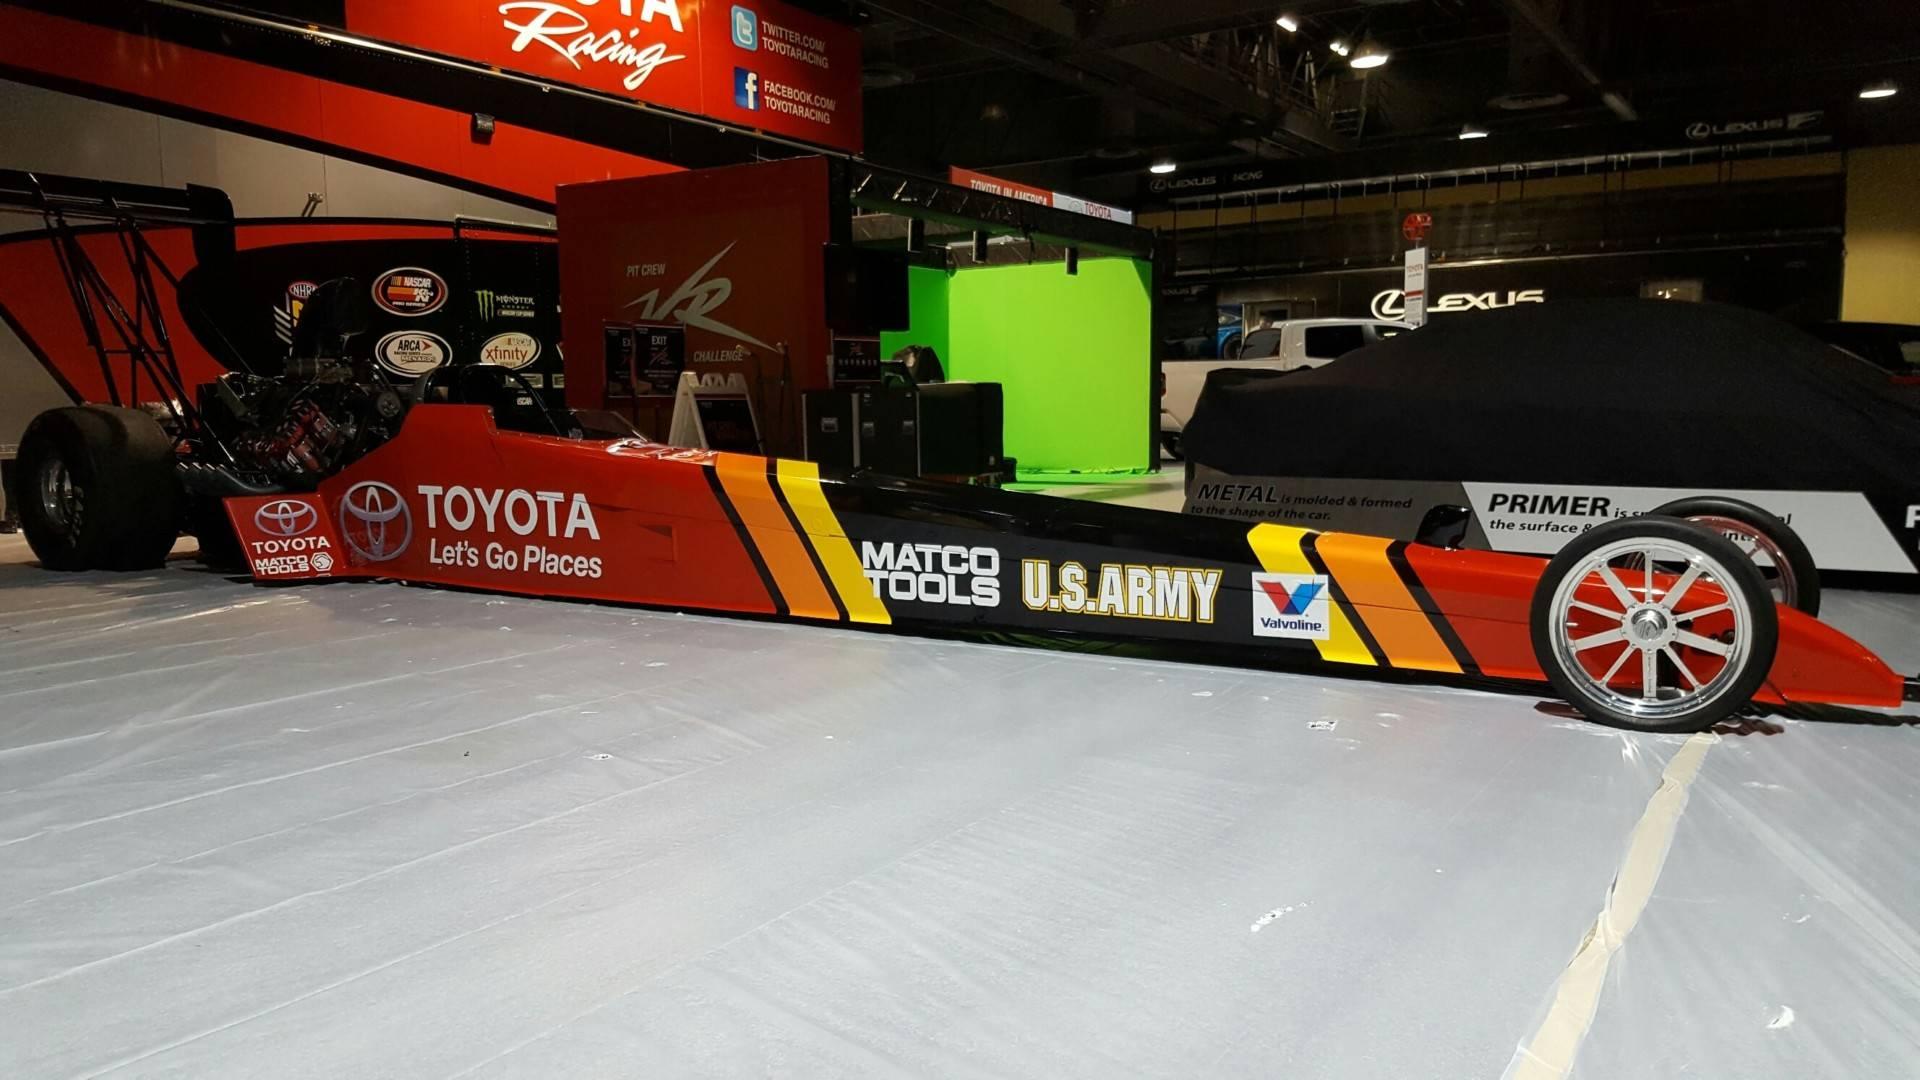 Toyota Race Car Custom Wrap Carwraps Com